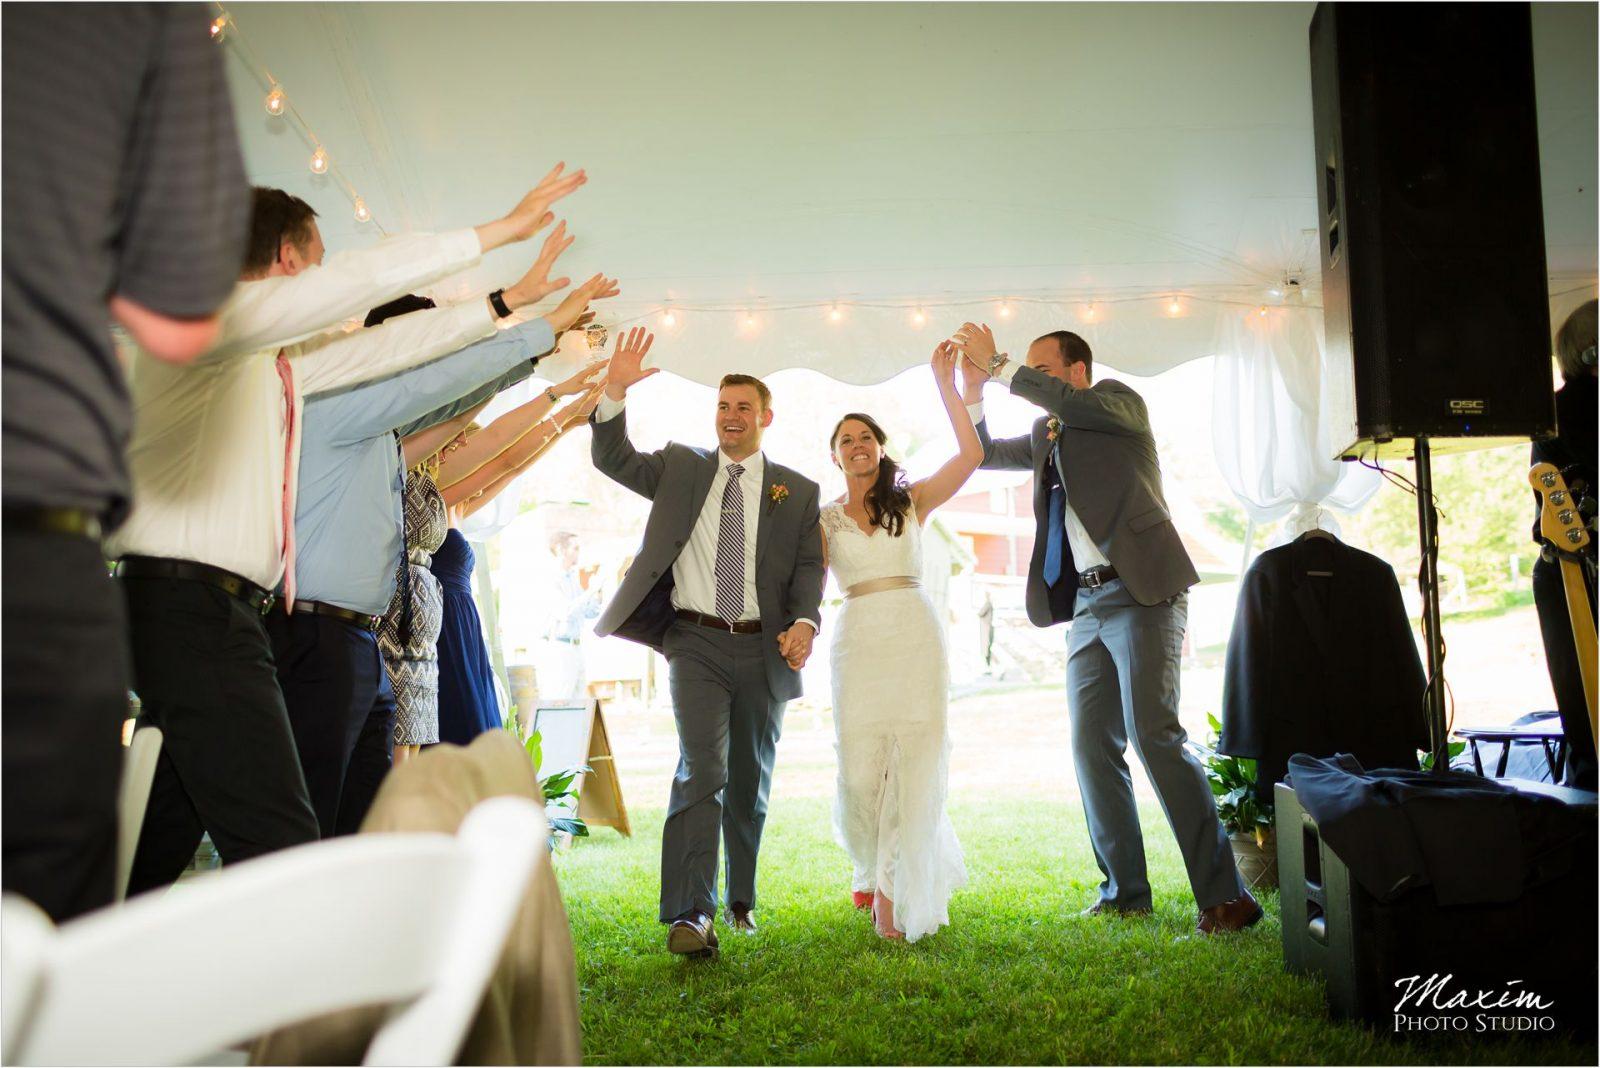 Potato Hill Farm Wedding Reception entrance Bride Groom